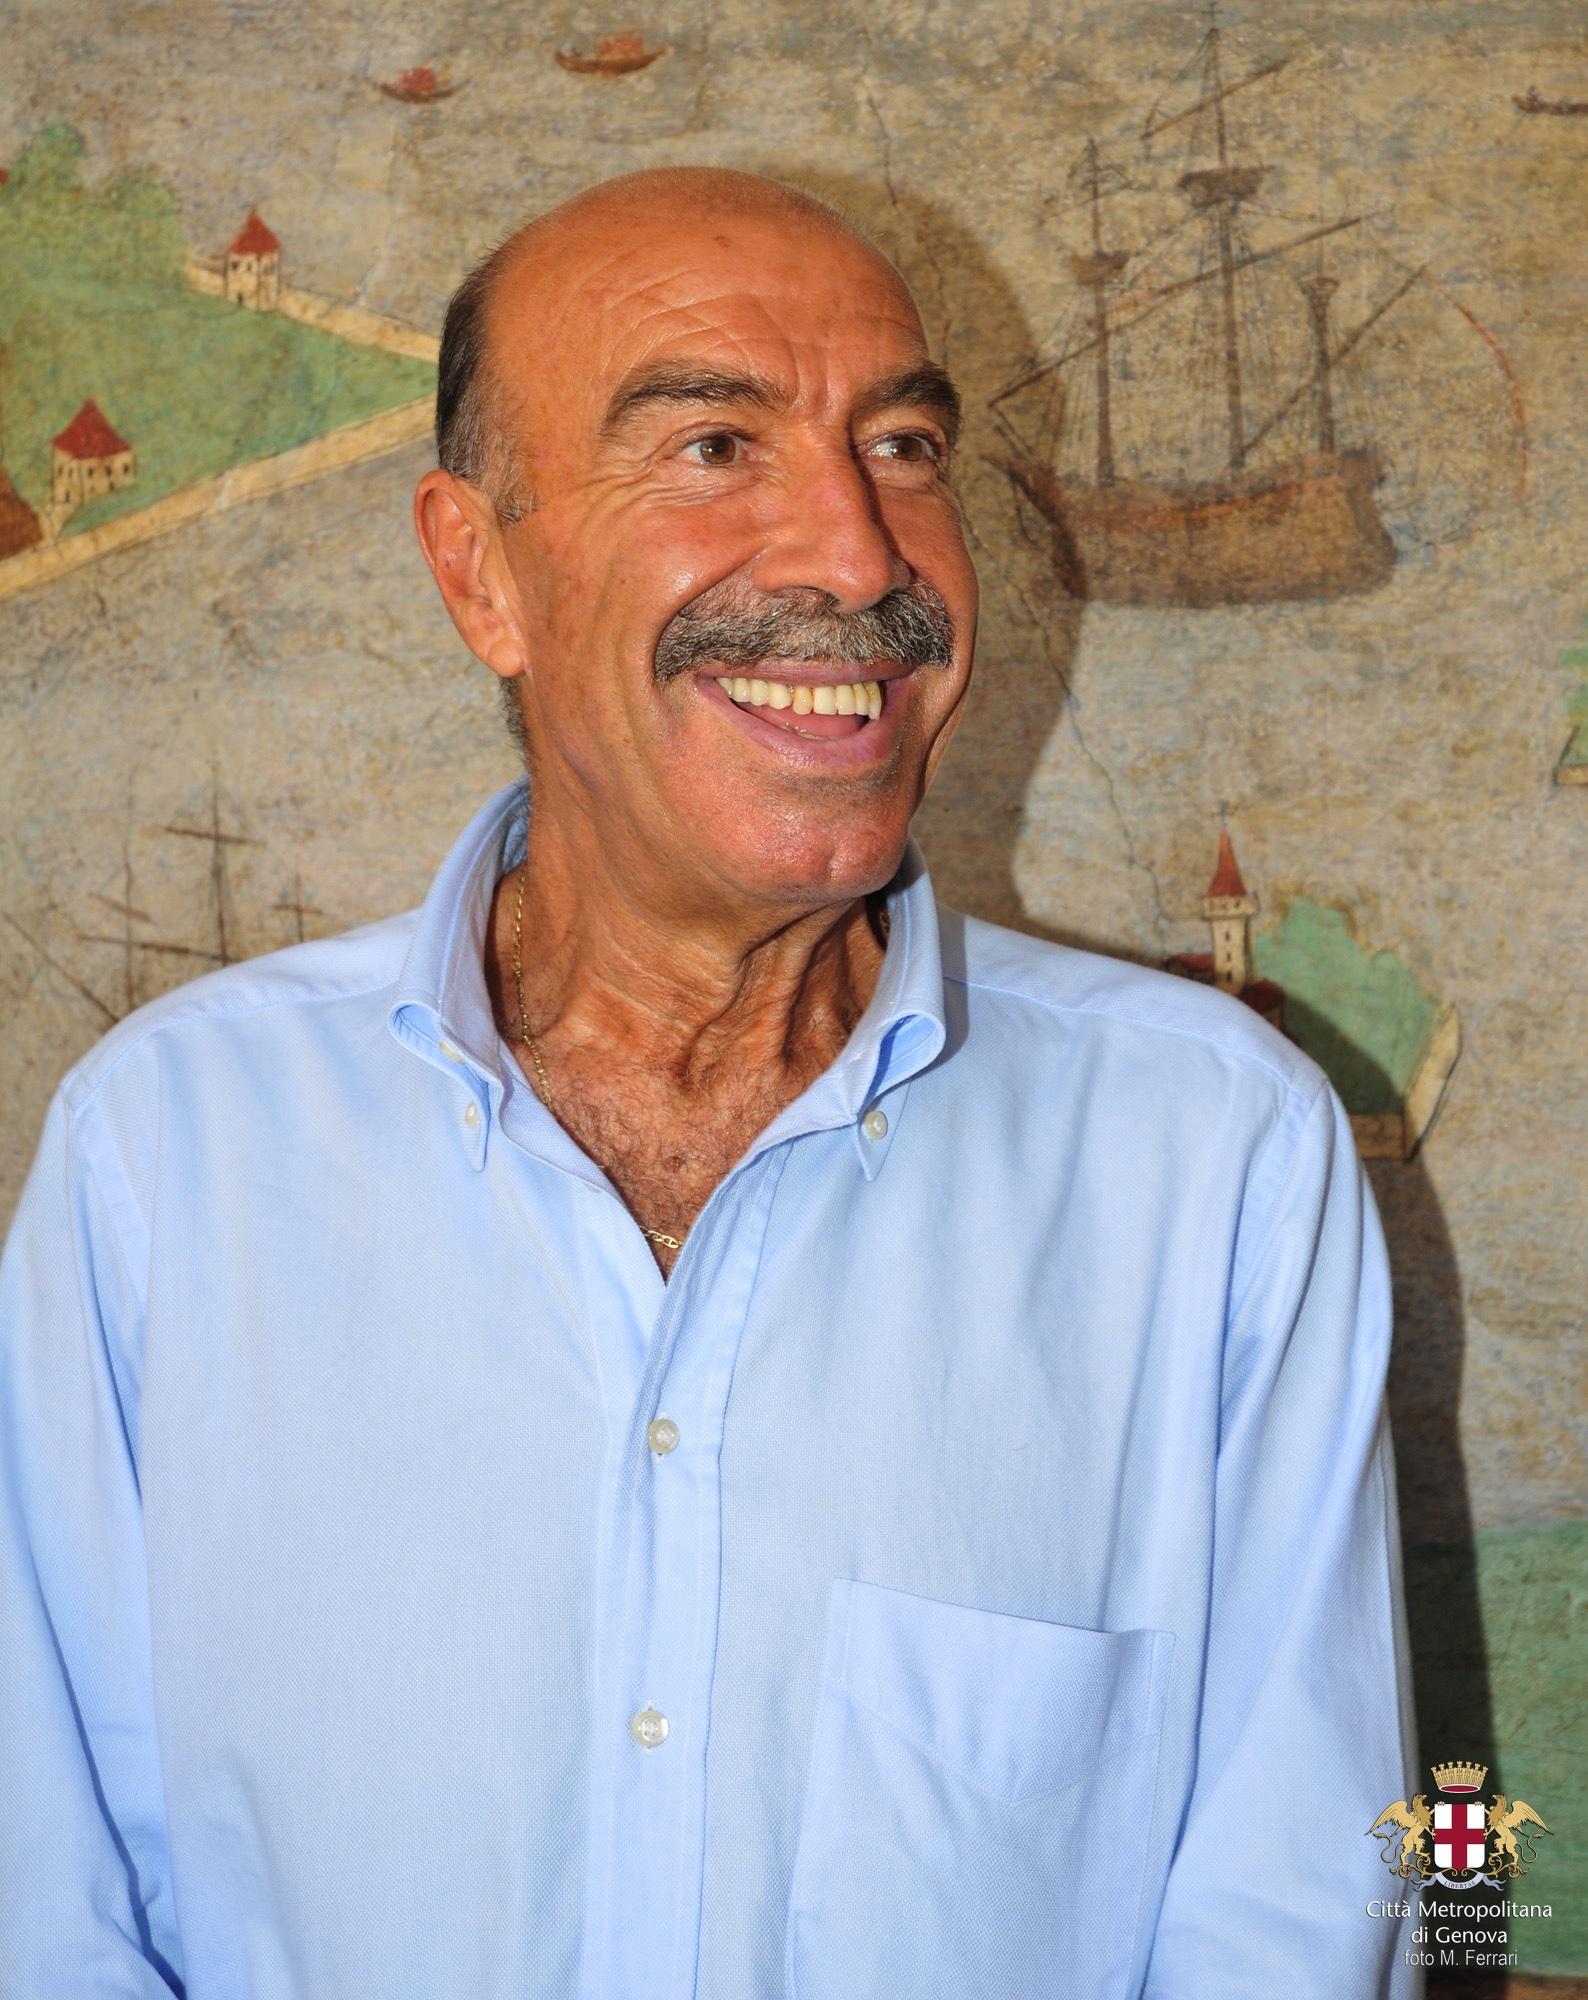 Sergio Aveto